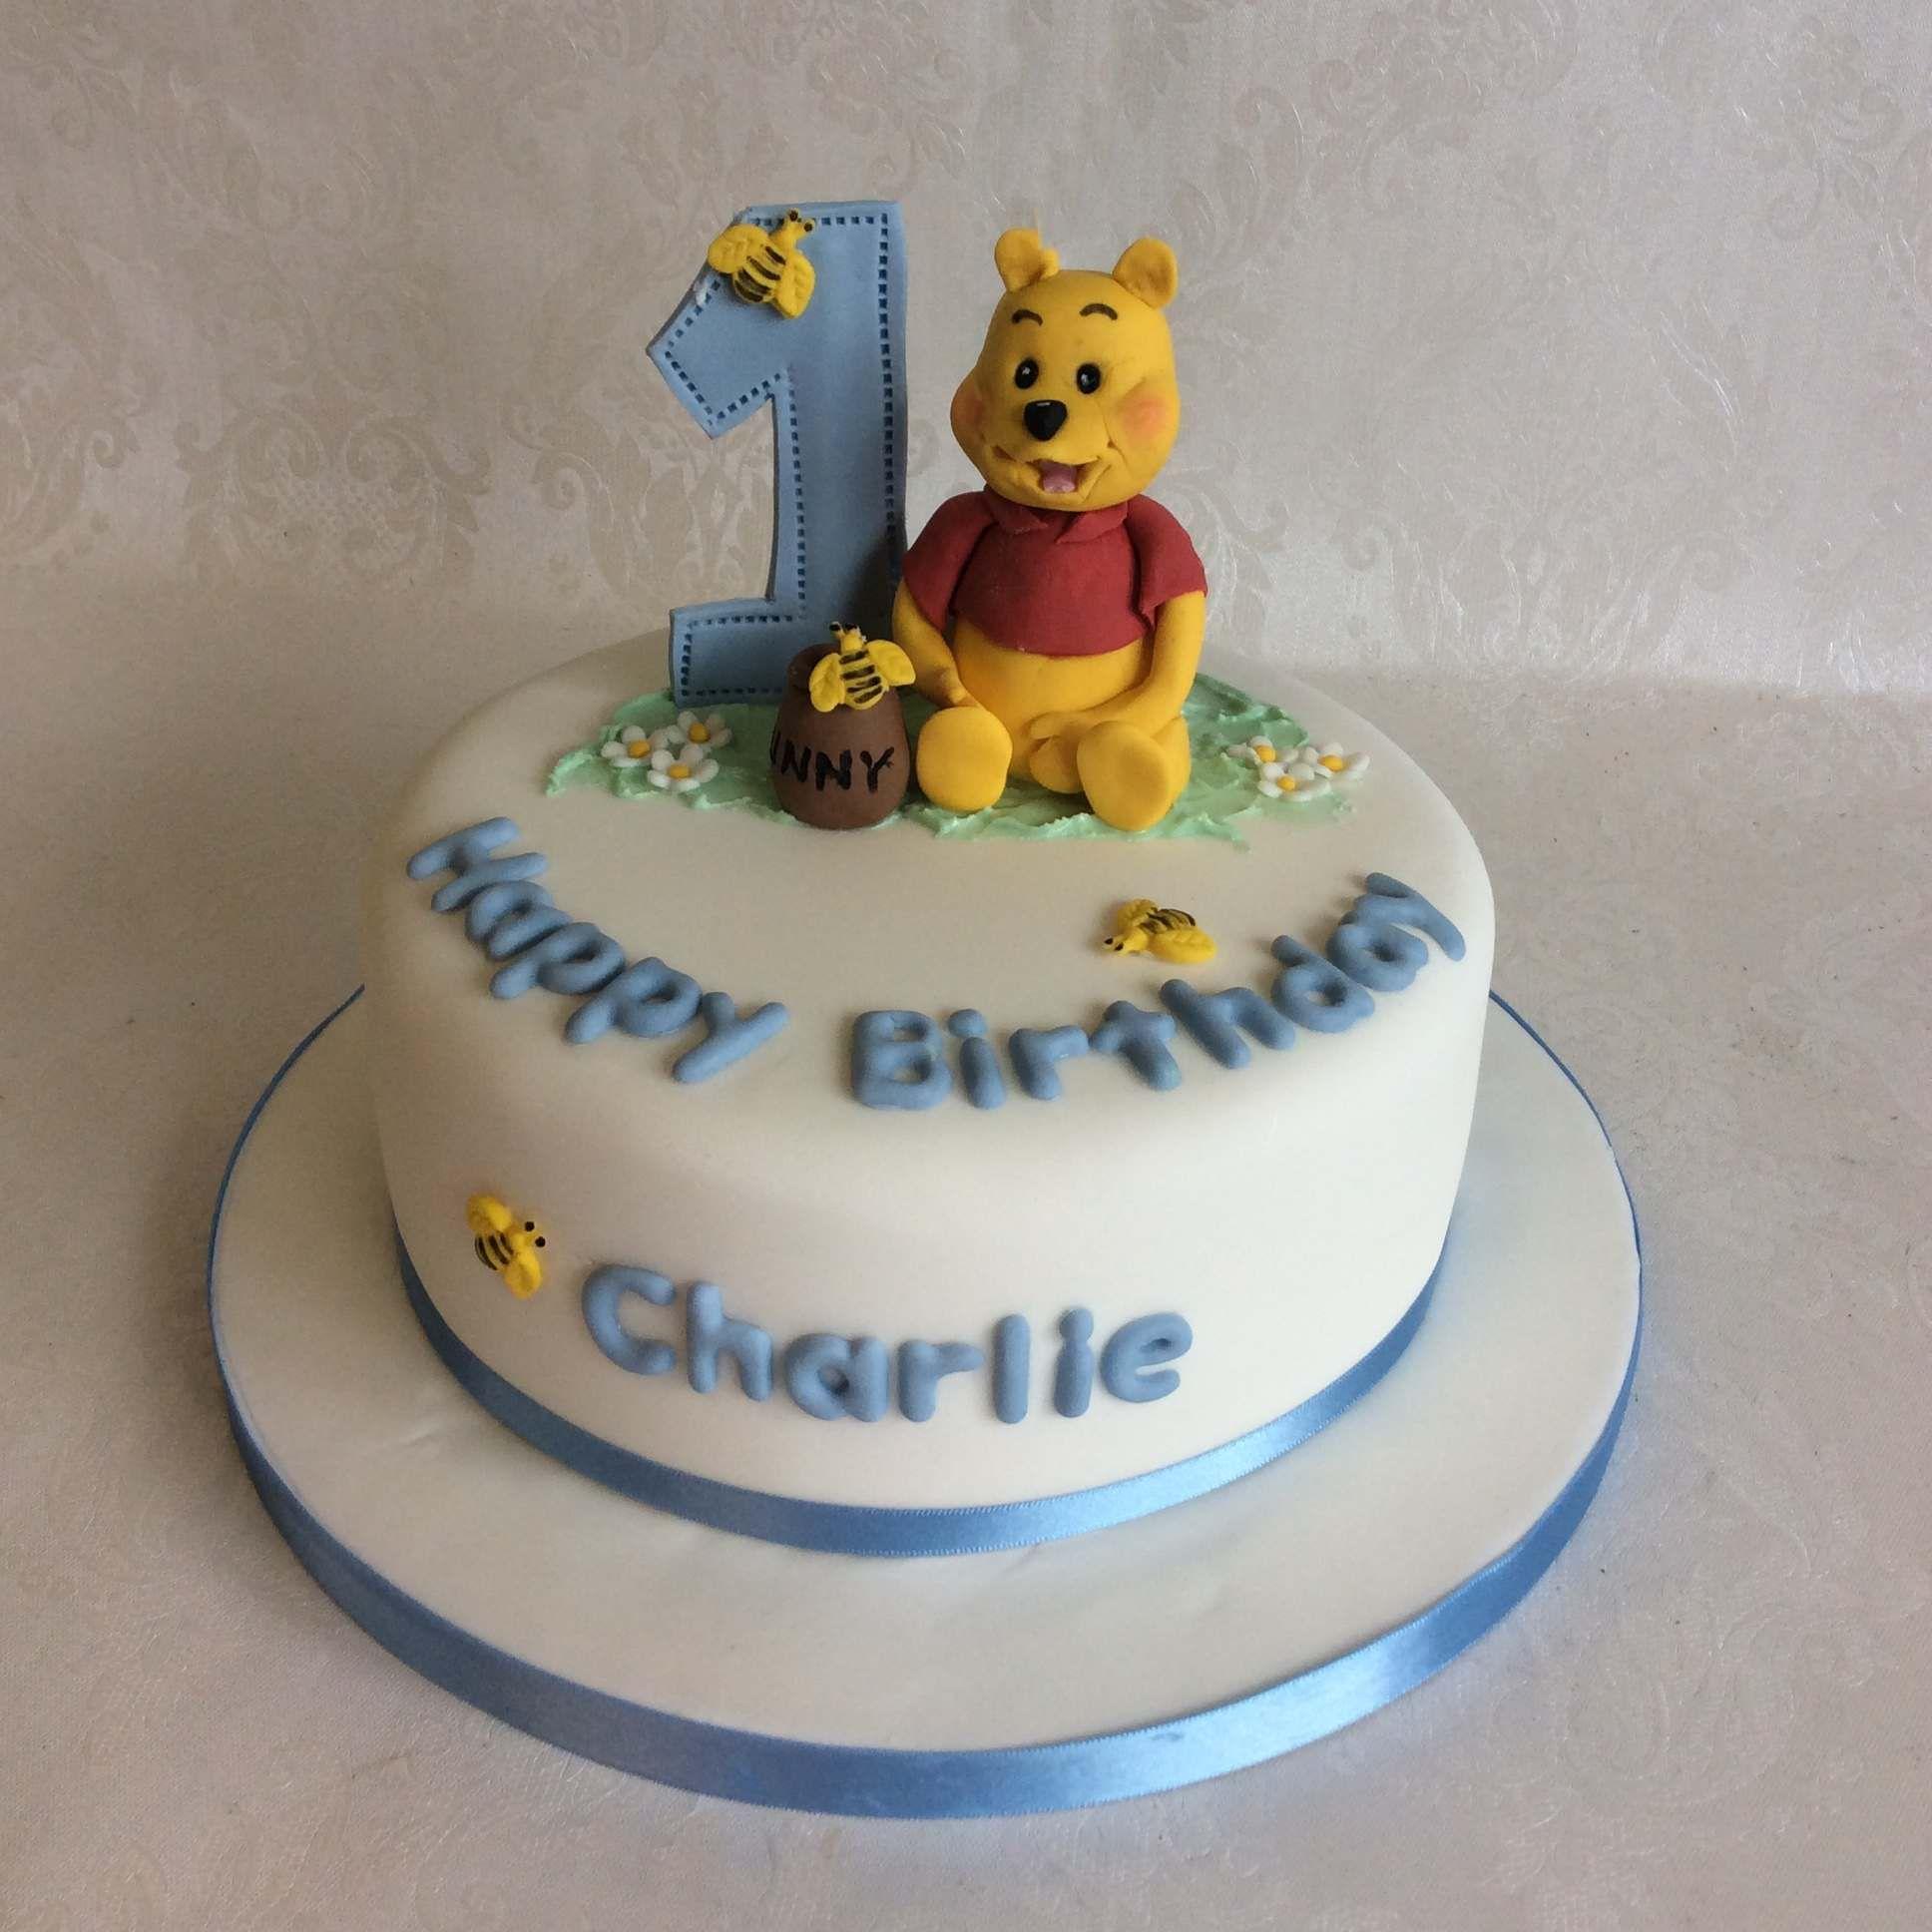 Simple Winnie cake for a little boy's 1st birthday